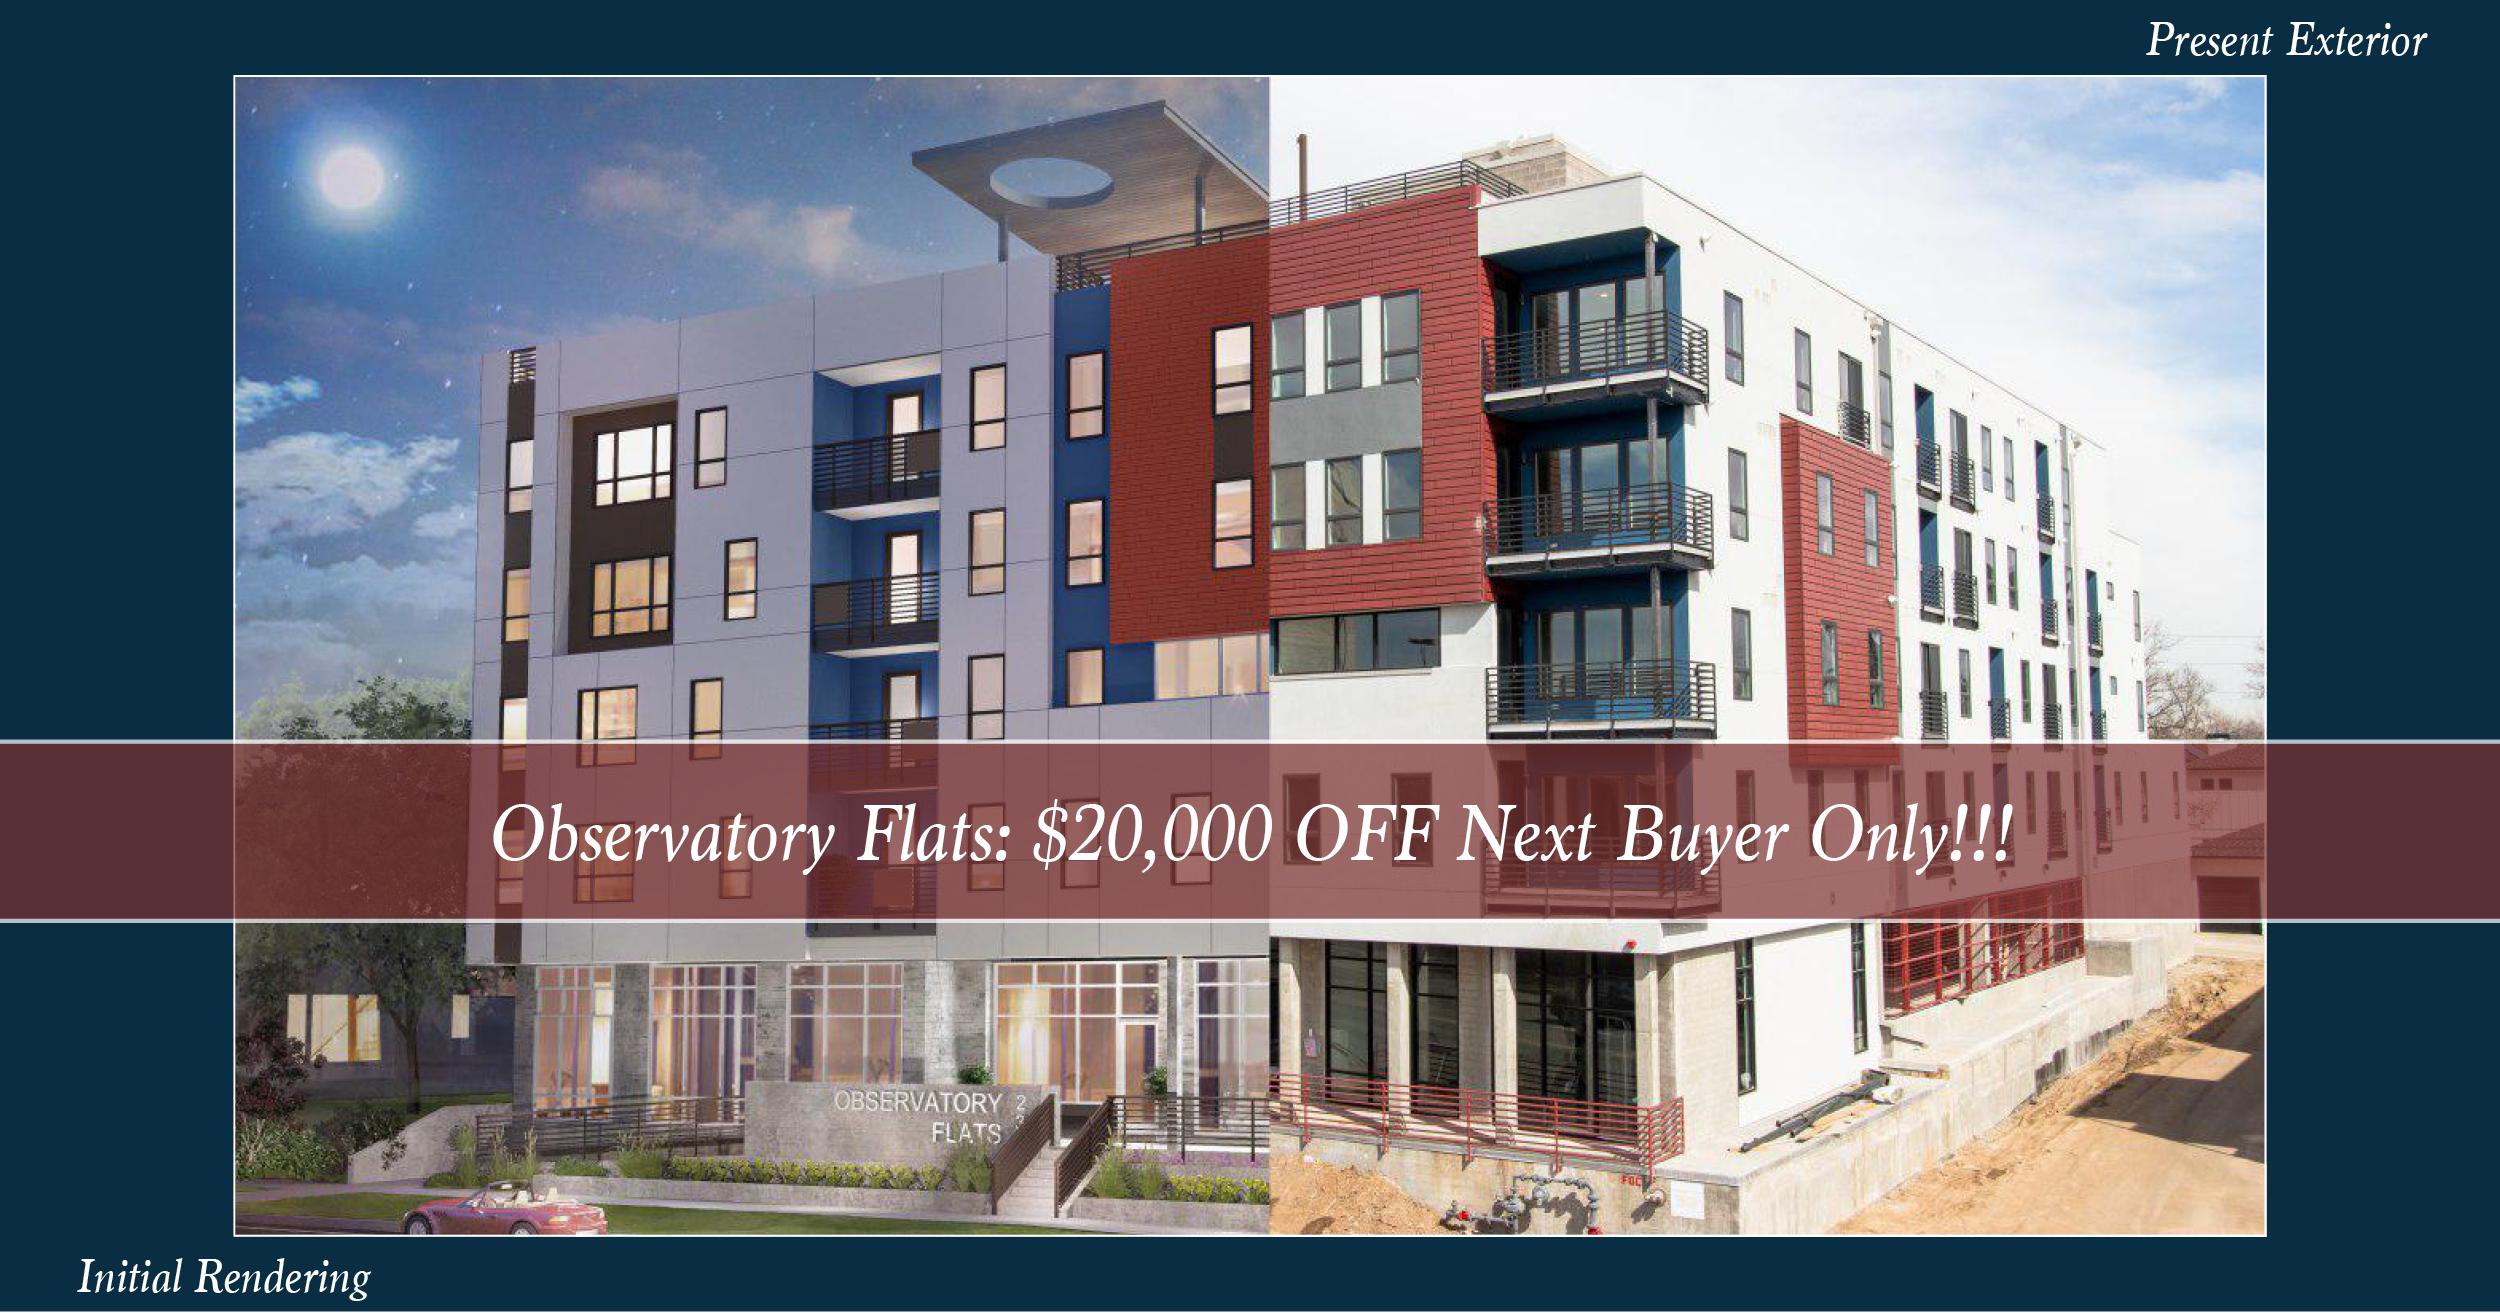 Ob Flats special offer.jpg